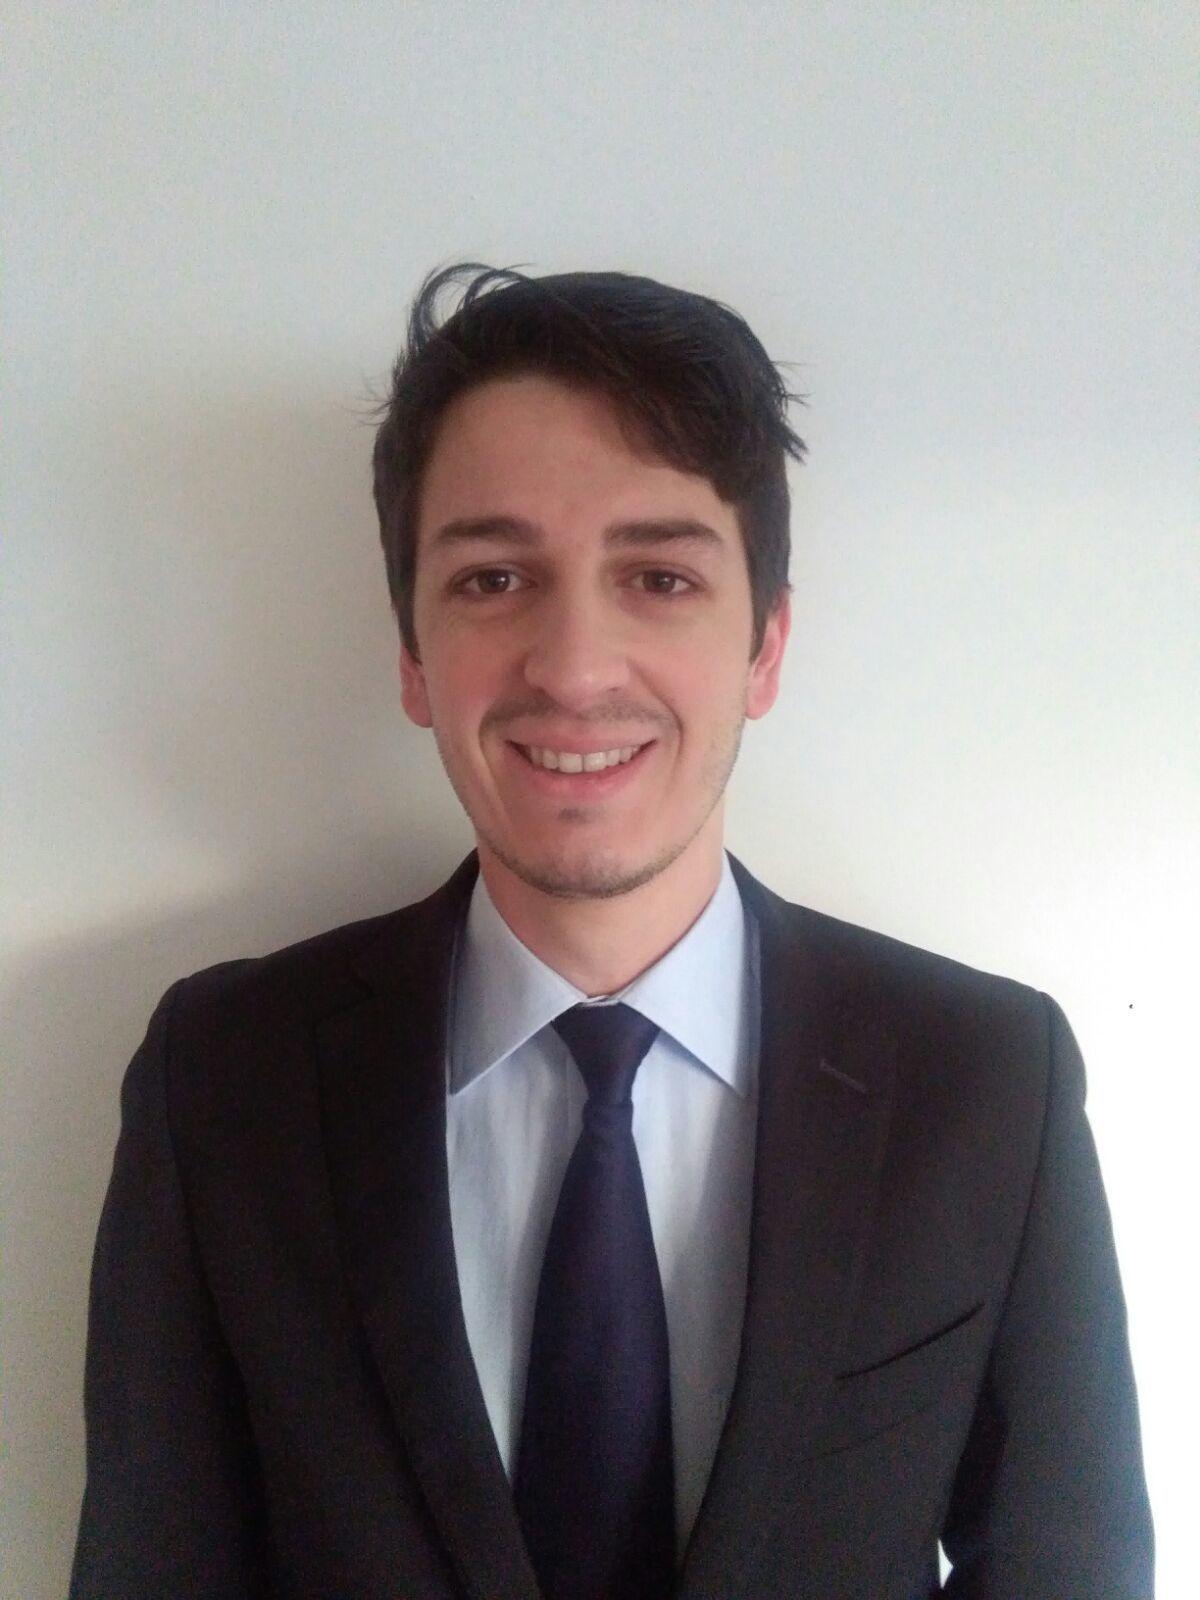 Tiago Boura